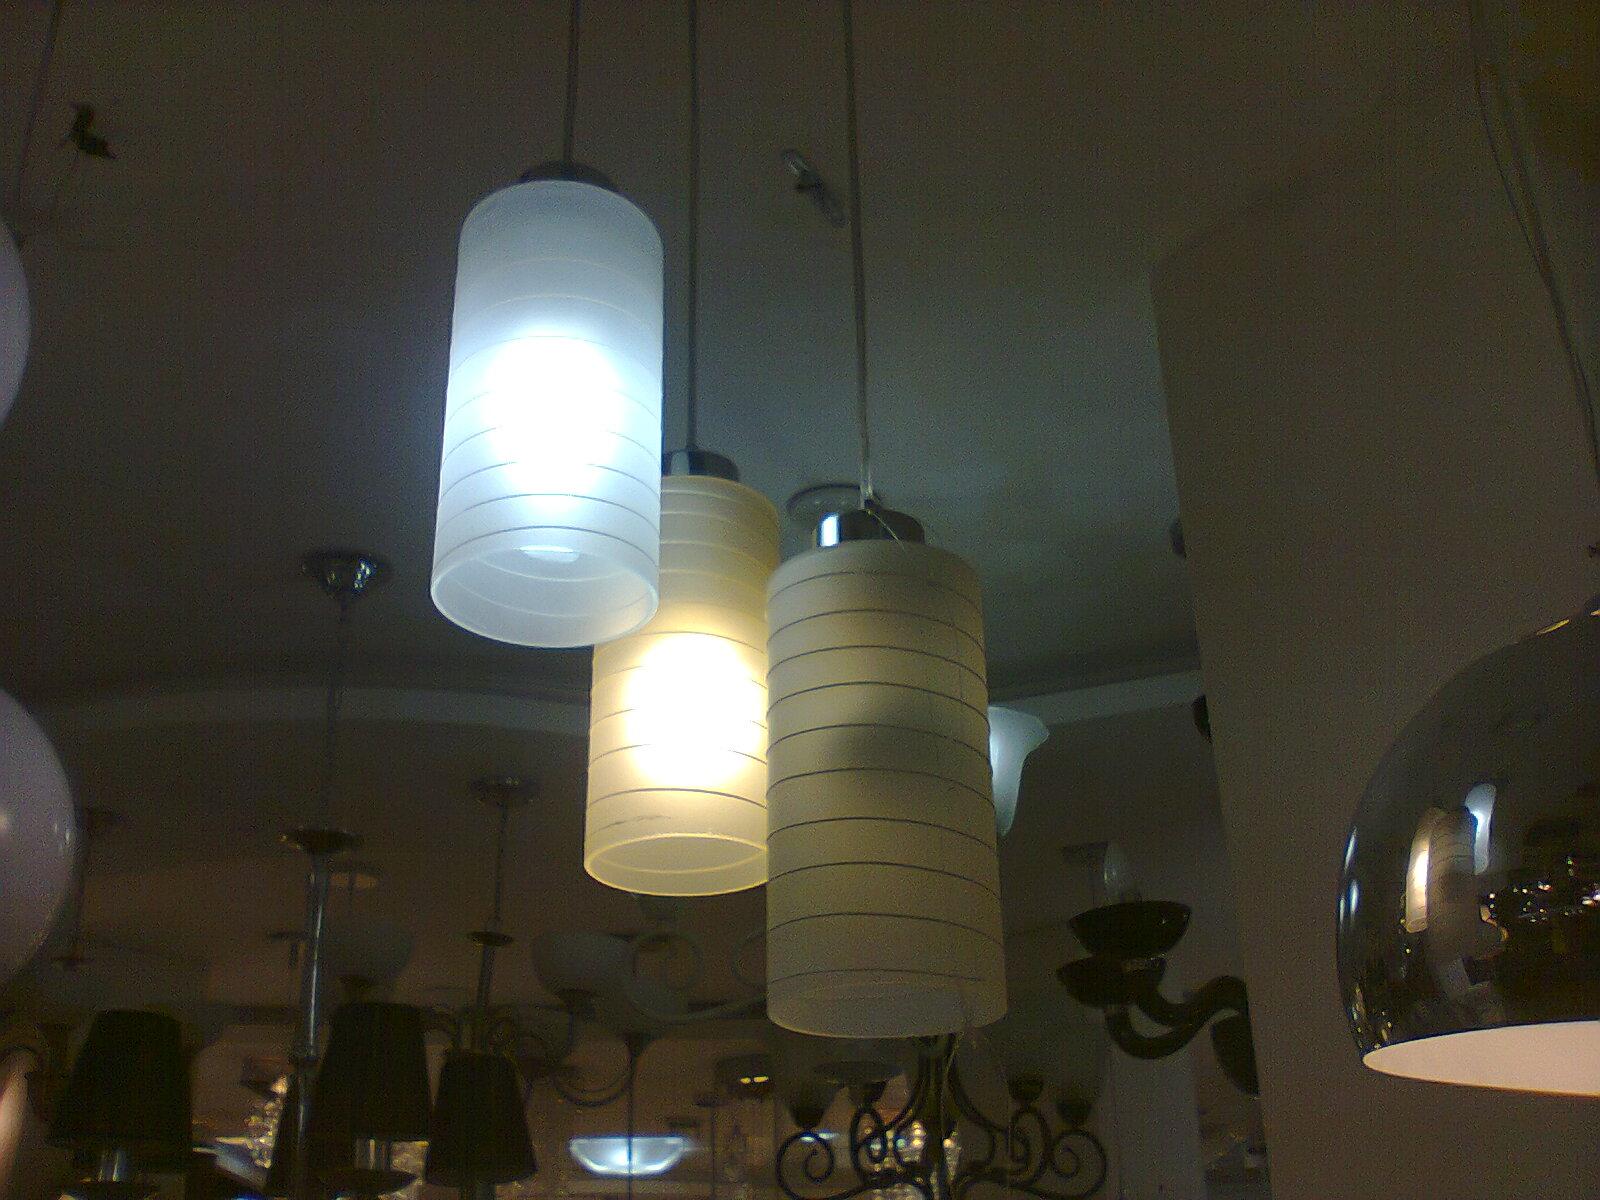 Objetos de desejo lustres e pendentes para sala de jantar - Tegola americana leroy merlin ...